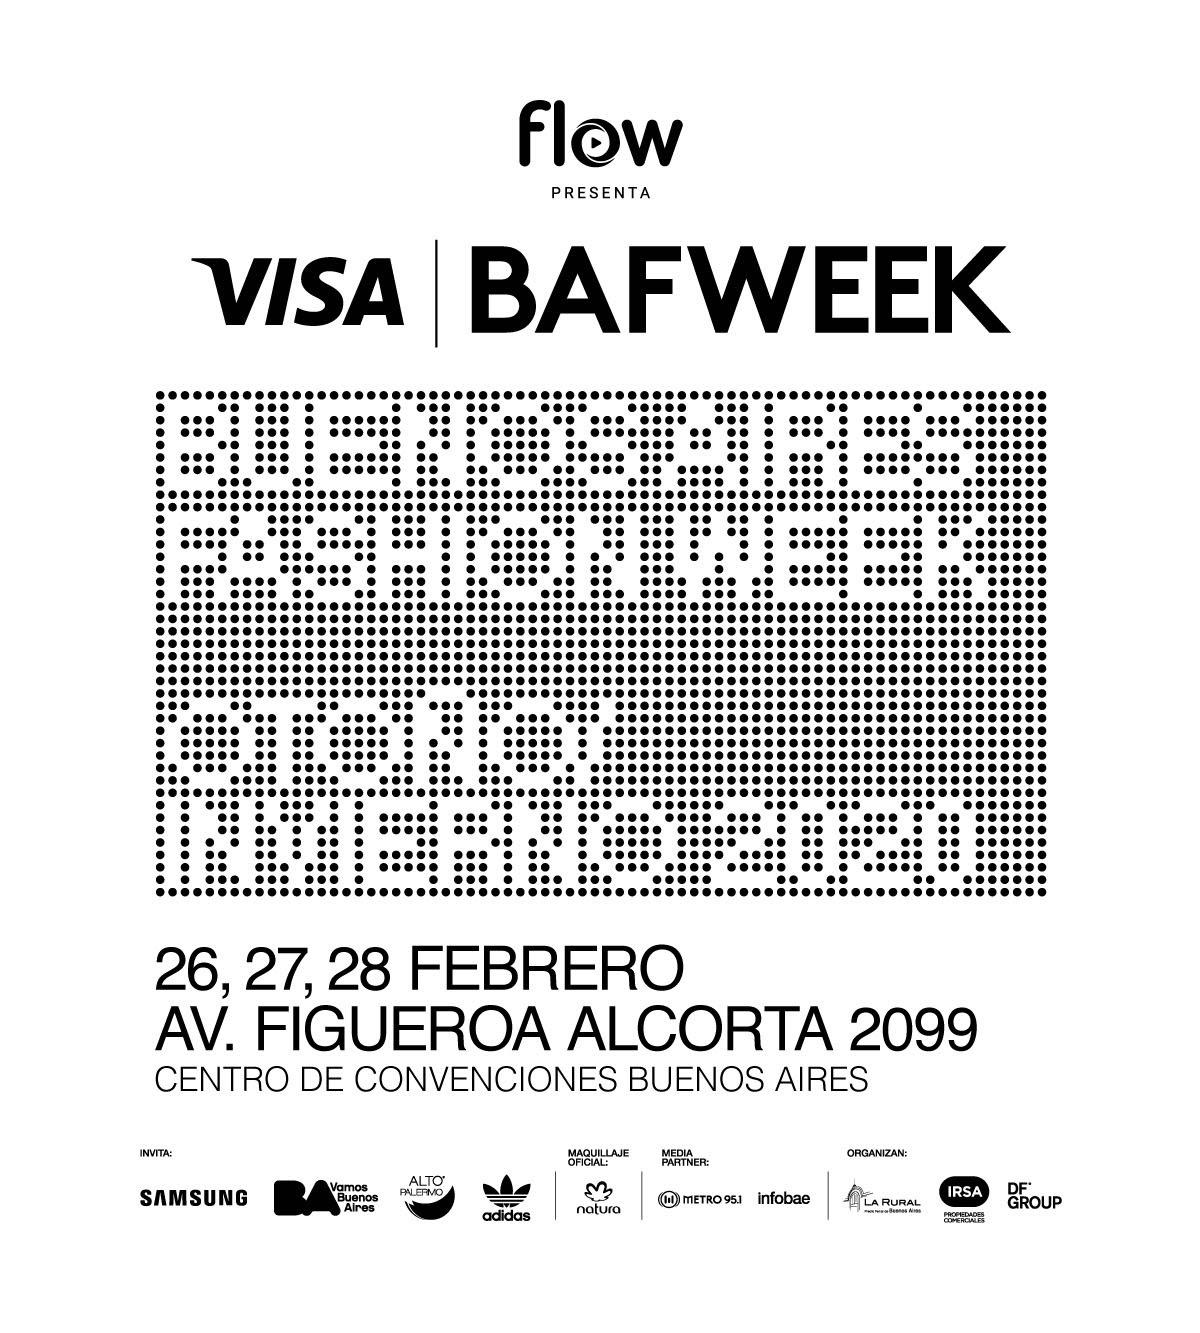 bafweek  Flow presenta VISA BAFWEEK FW20